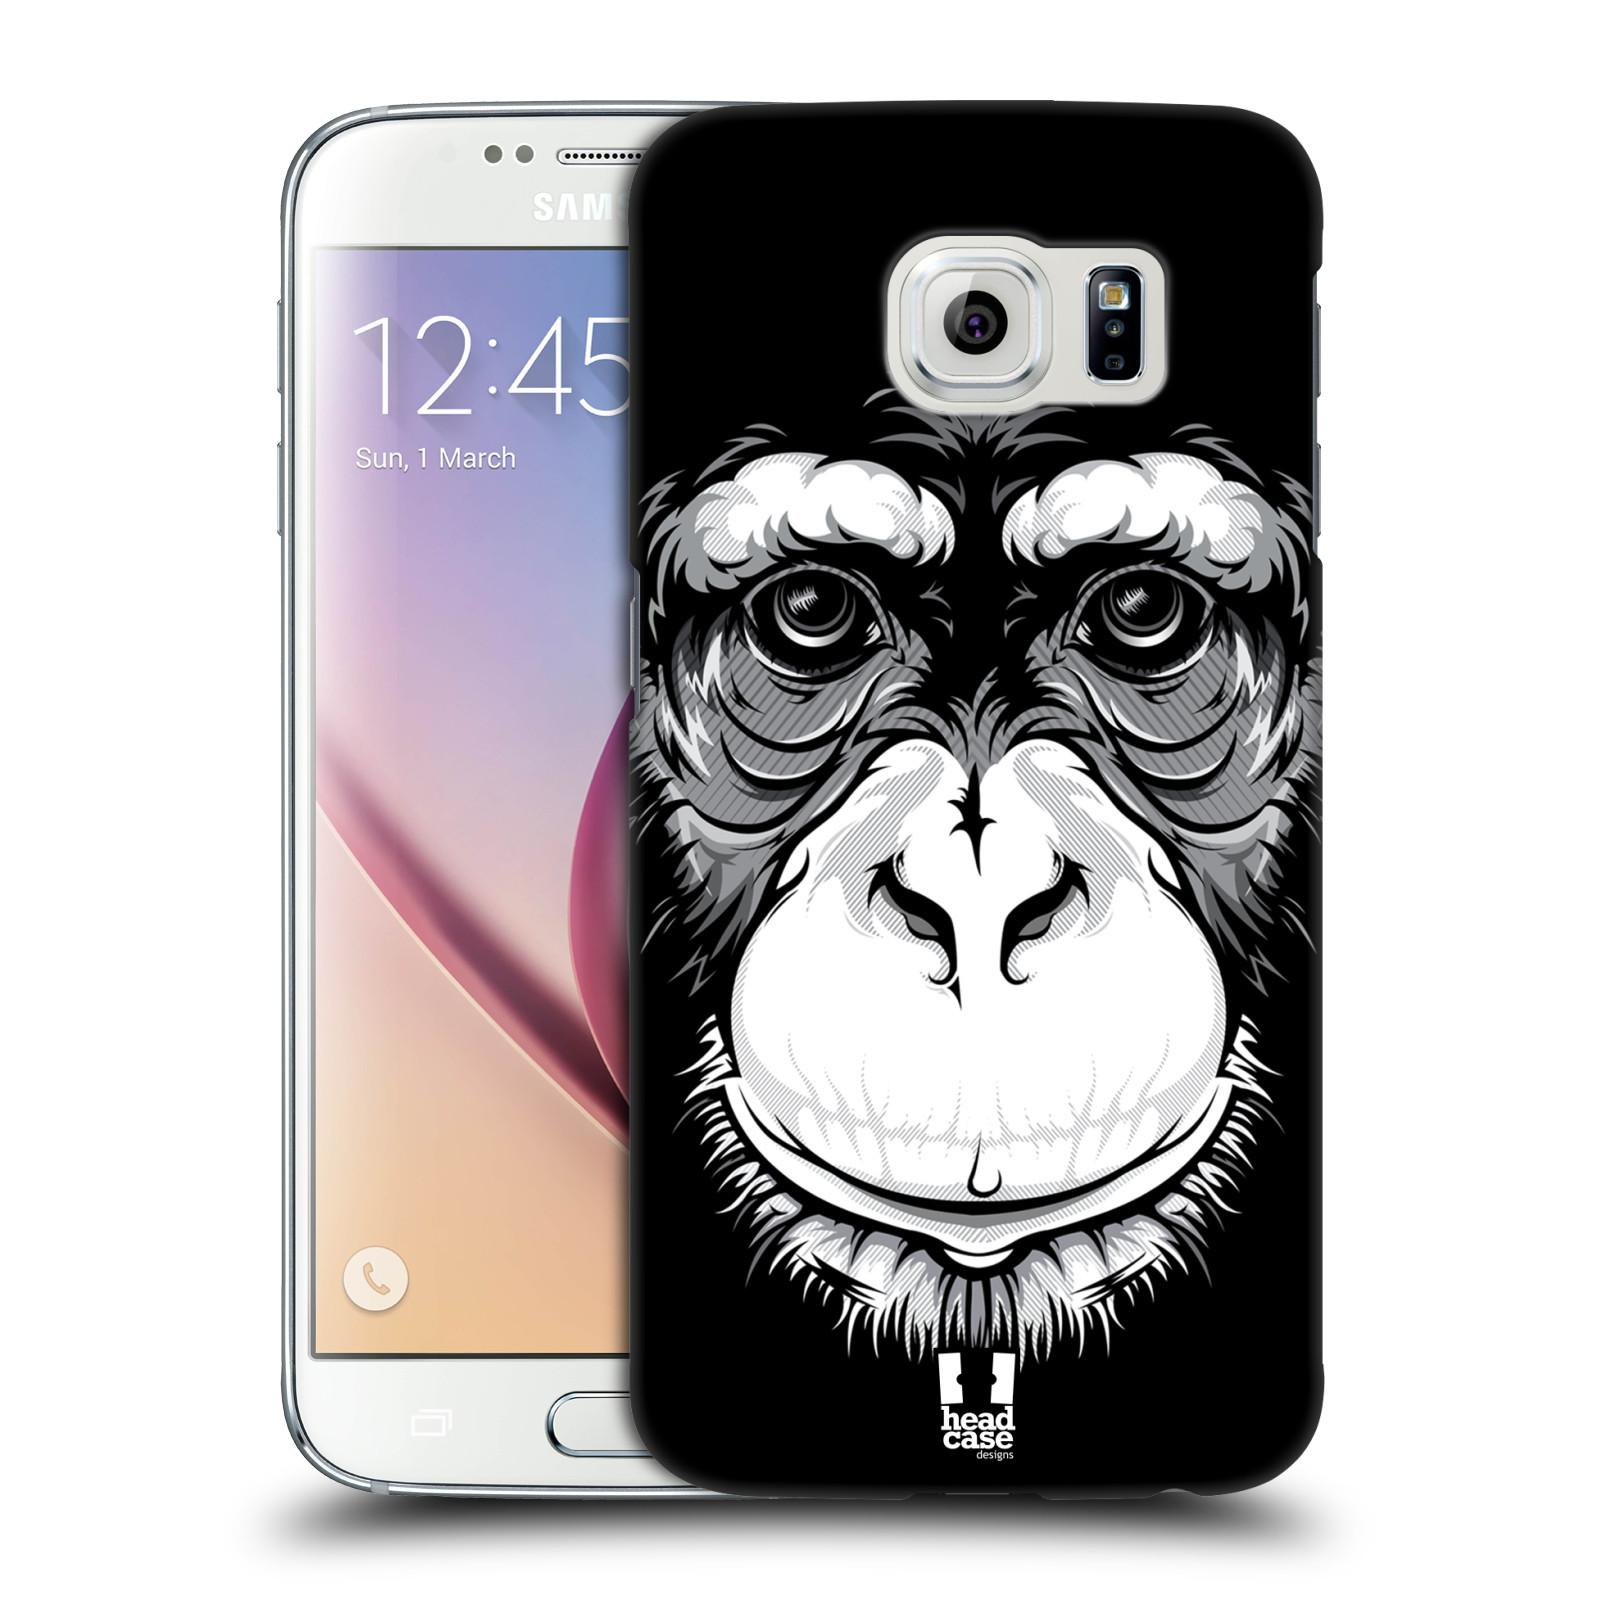 HEAD CASE plastový obal na mobil SAMSUNG Galaxy S6 (G9200, G920F) vzor Zvíře kreslená tvář šimpanz